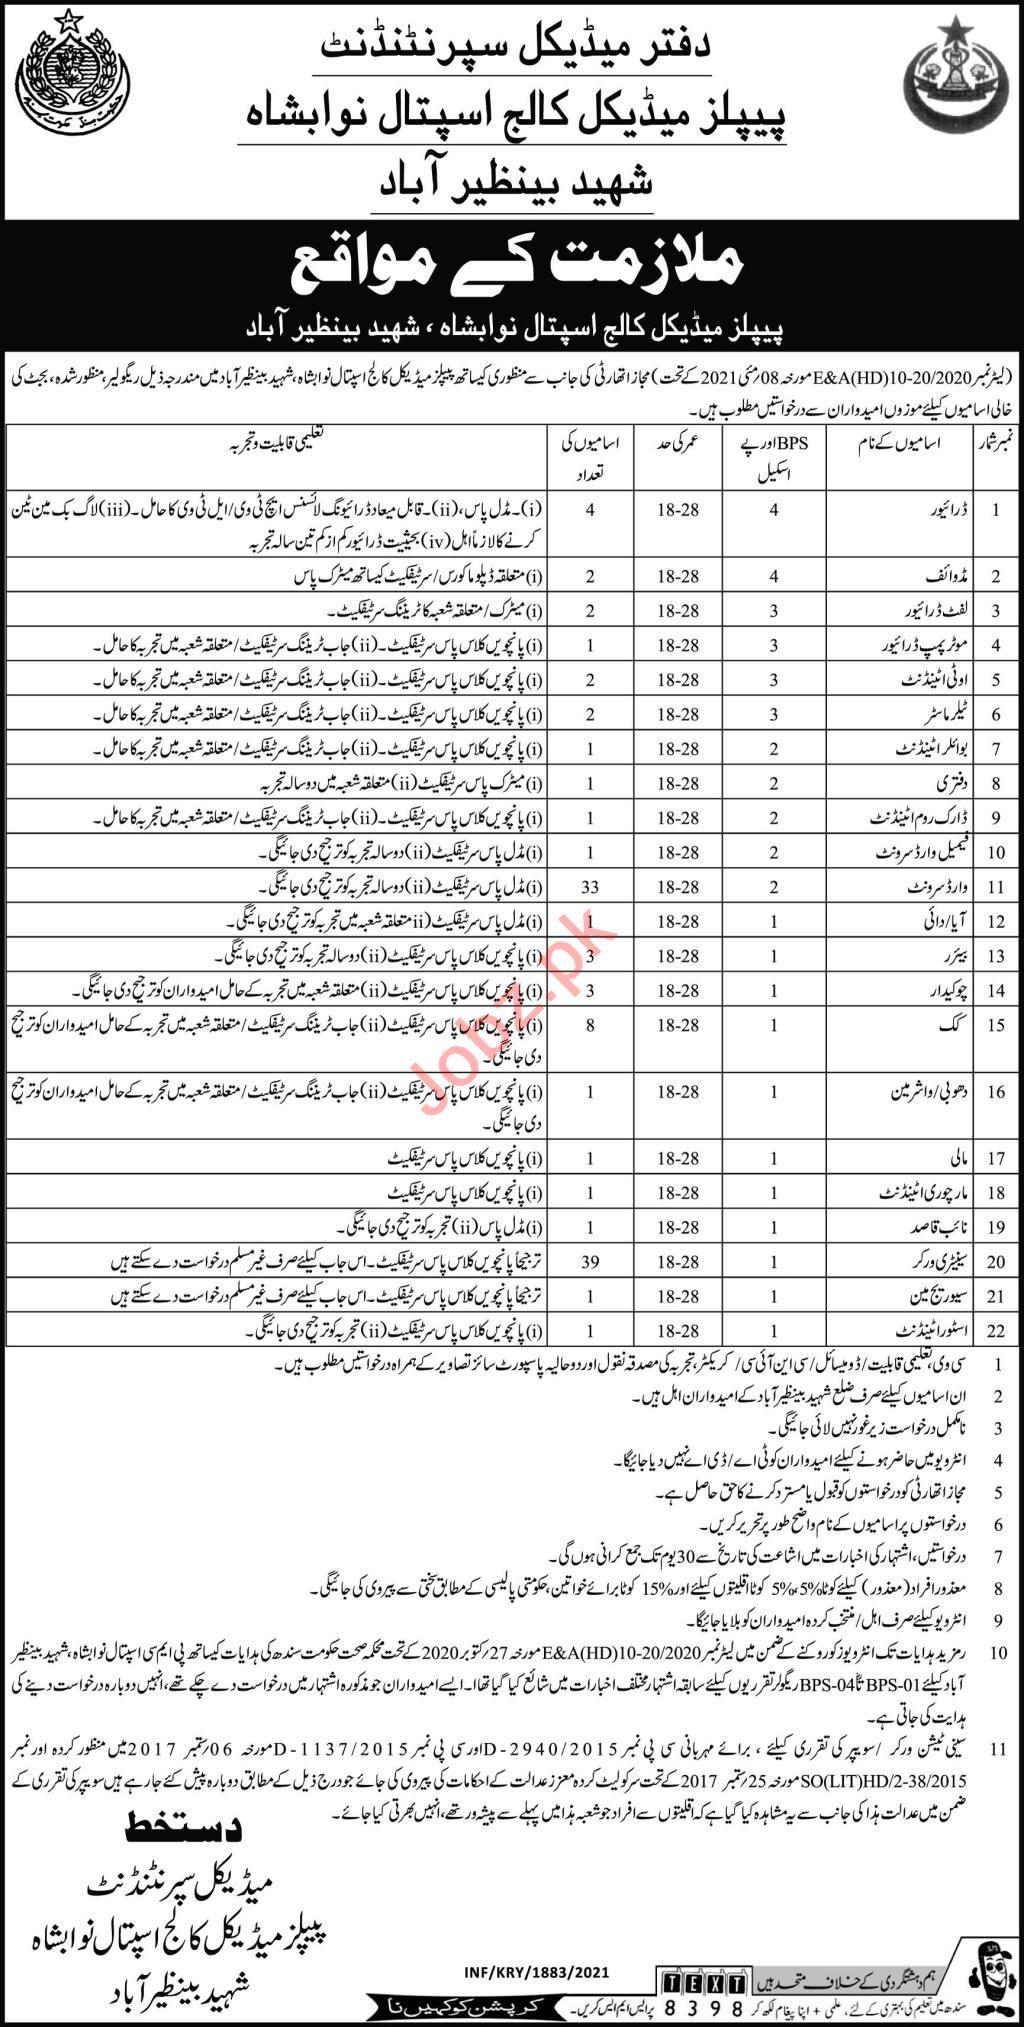 Peoples Medical College Hospital Shaheed Benazirabad Jobs